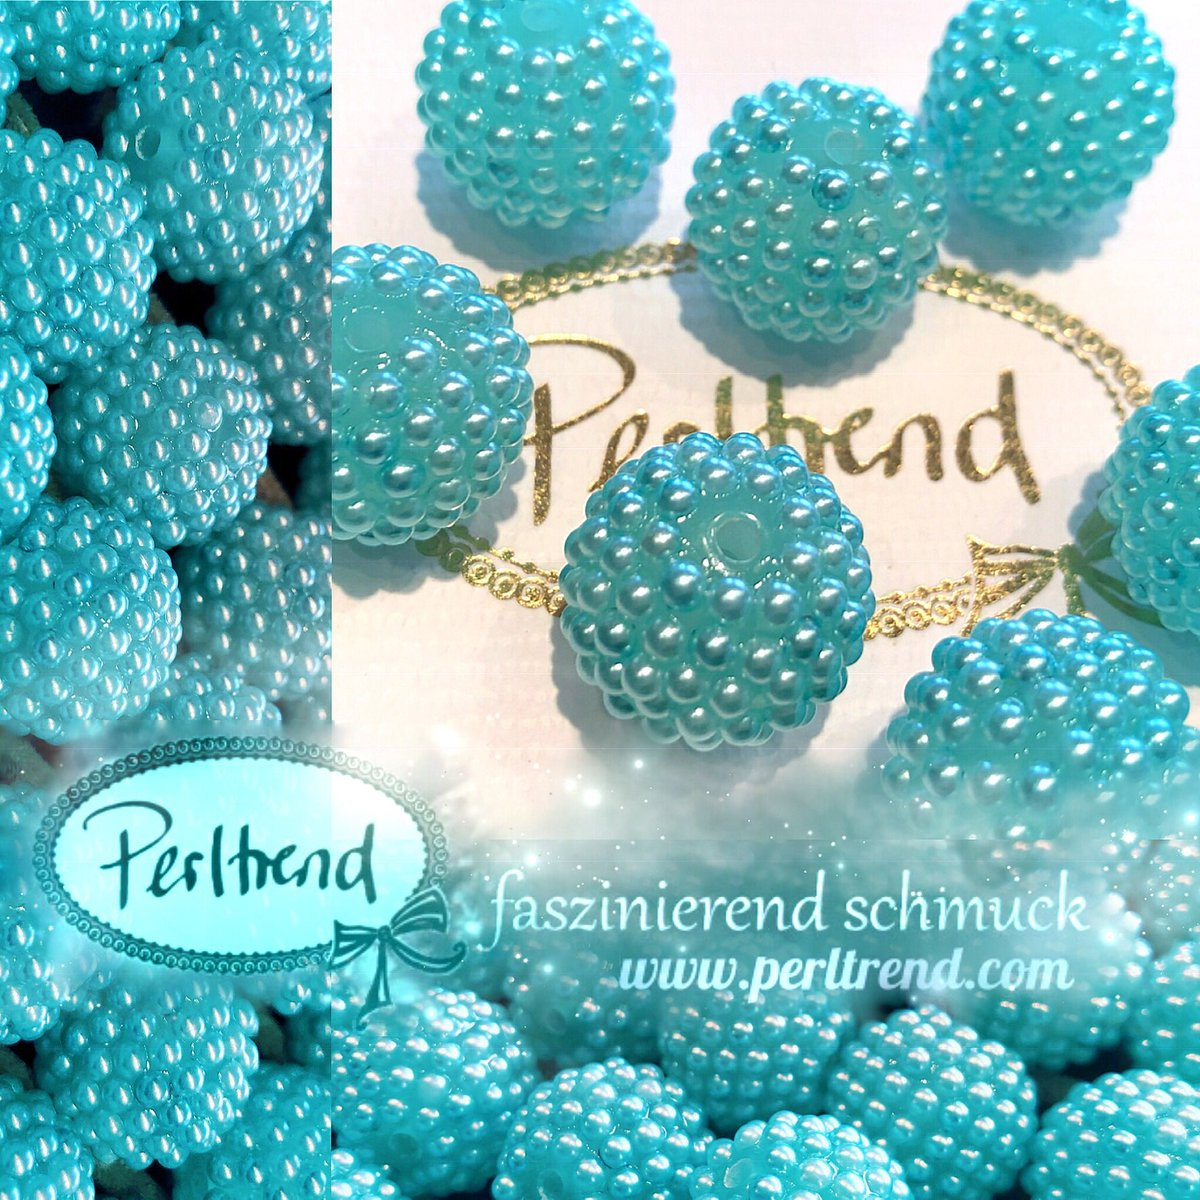 https://instagram.com/p/BsKhViWAmTF/ #perltrend #luzern #schweiz #switzerland #onlineshop #schmuck #jewellery #jewelry #accessories #beads #perlen #pearls #fashion #mode #jewellerydesign #schmuckzubehör #diy #jewellerysupplies #türkisblau #türkis #blau #blue #turquoise  #bigpearls #cutepic.twitter.com/Ro4hLwrv9b